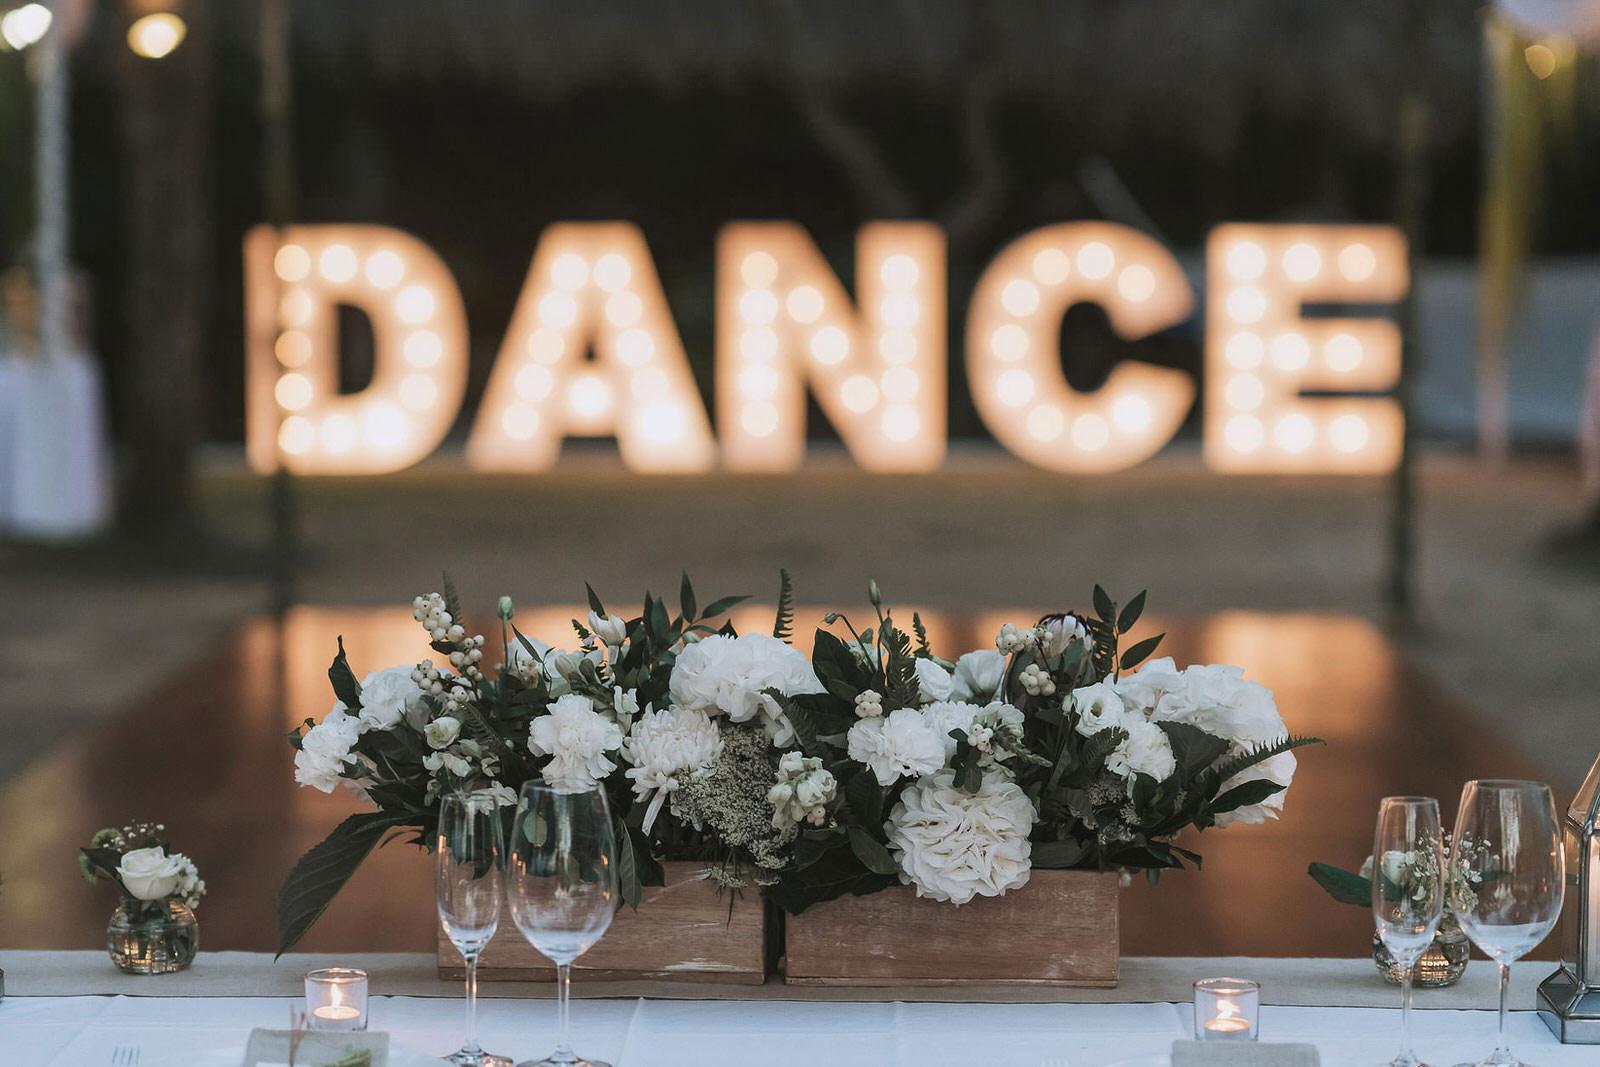 newfound-hai-tide-nusa-lembongan-bali-wedding-photographers-143